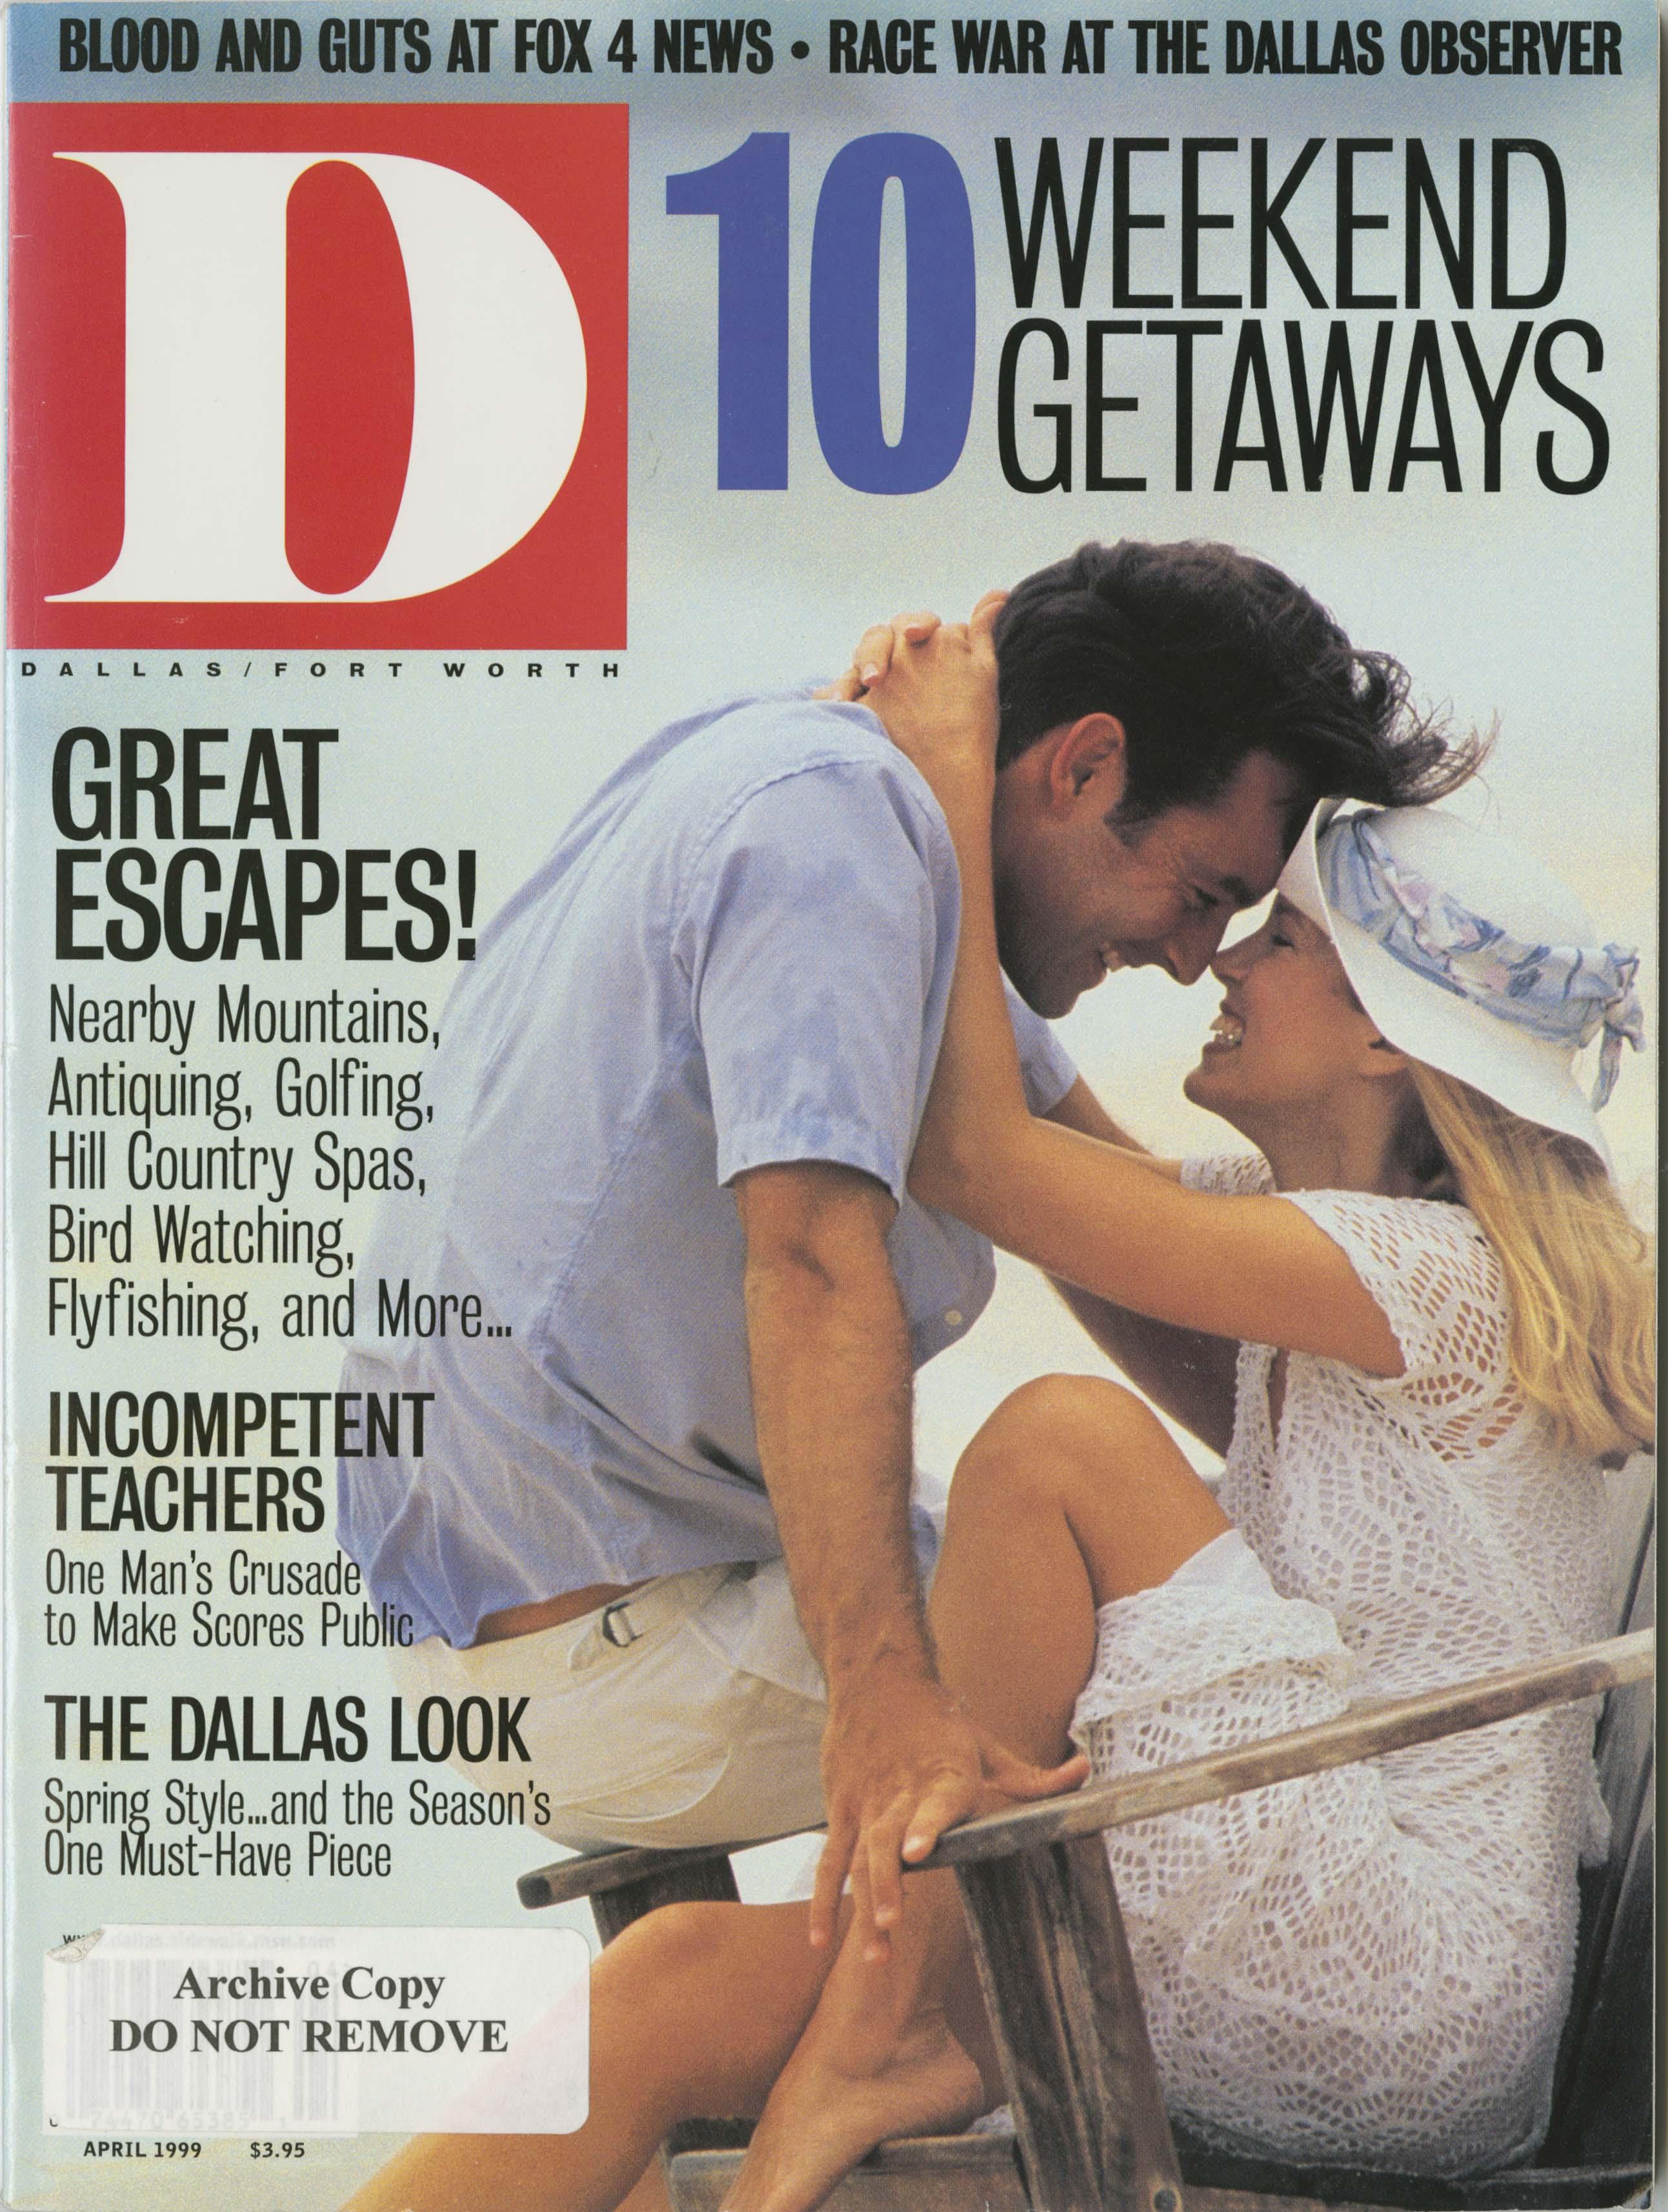 April 1999 cover